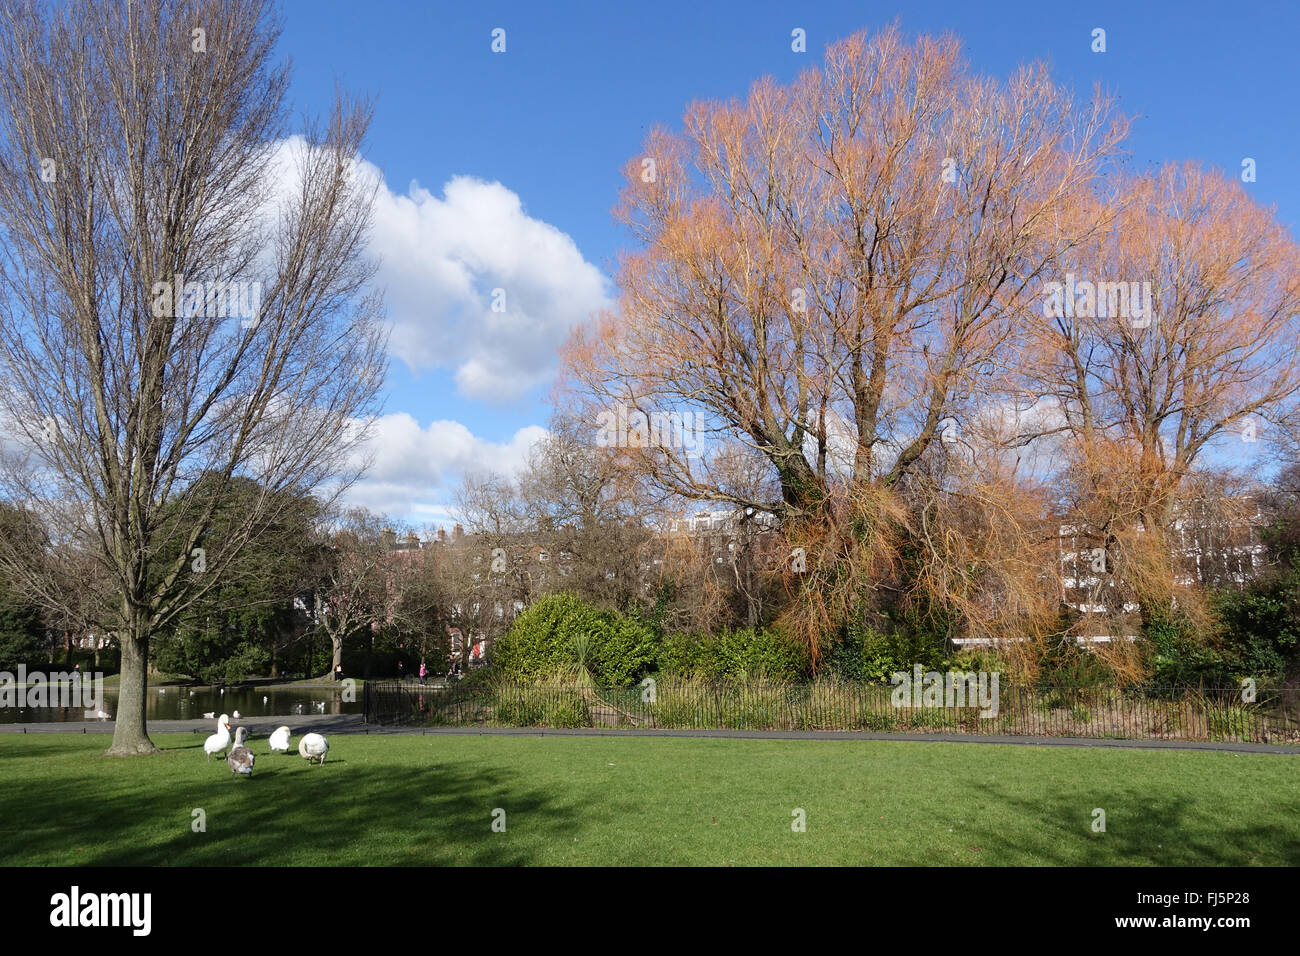 St. Stephen's Green Dublin Ireland -1 - Stock Image